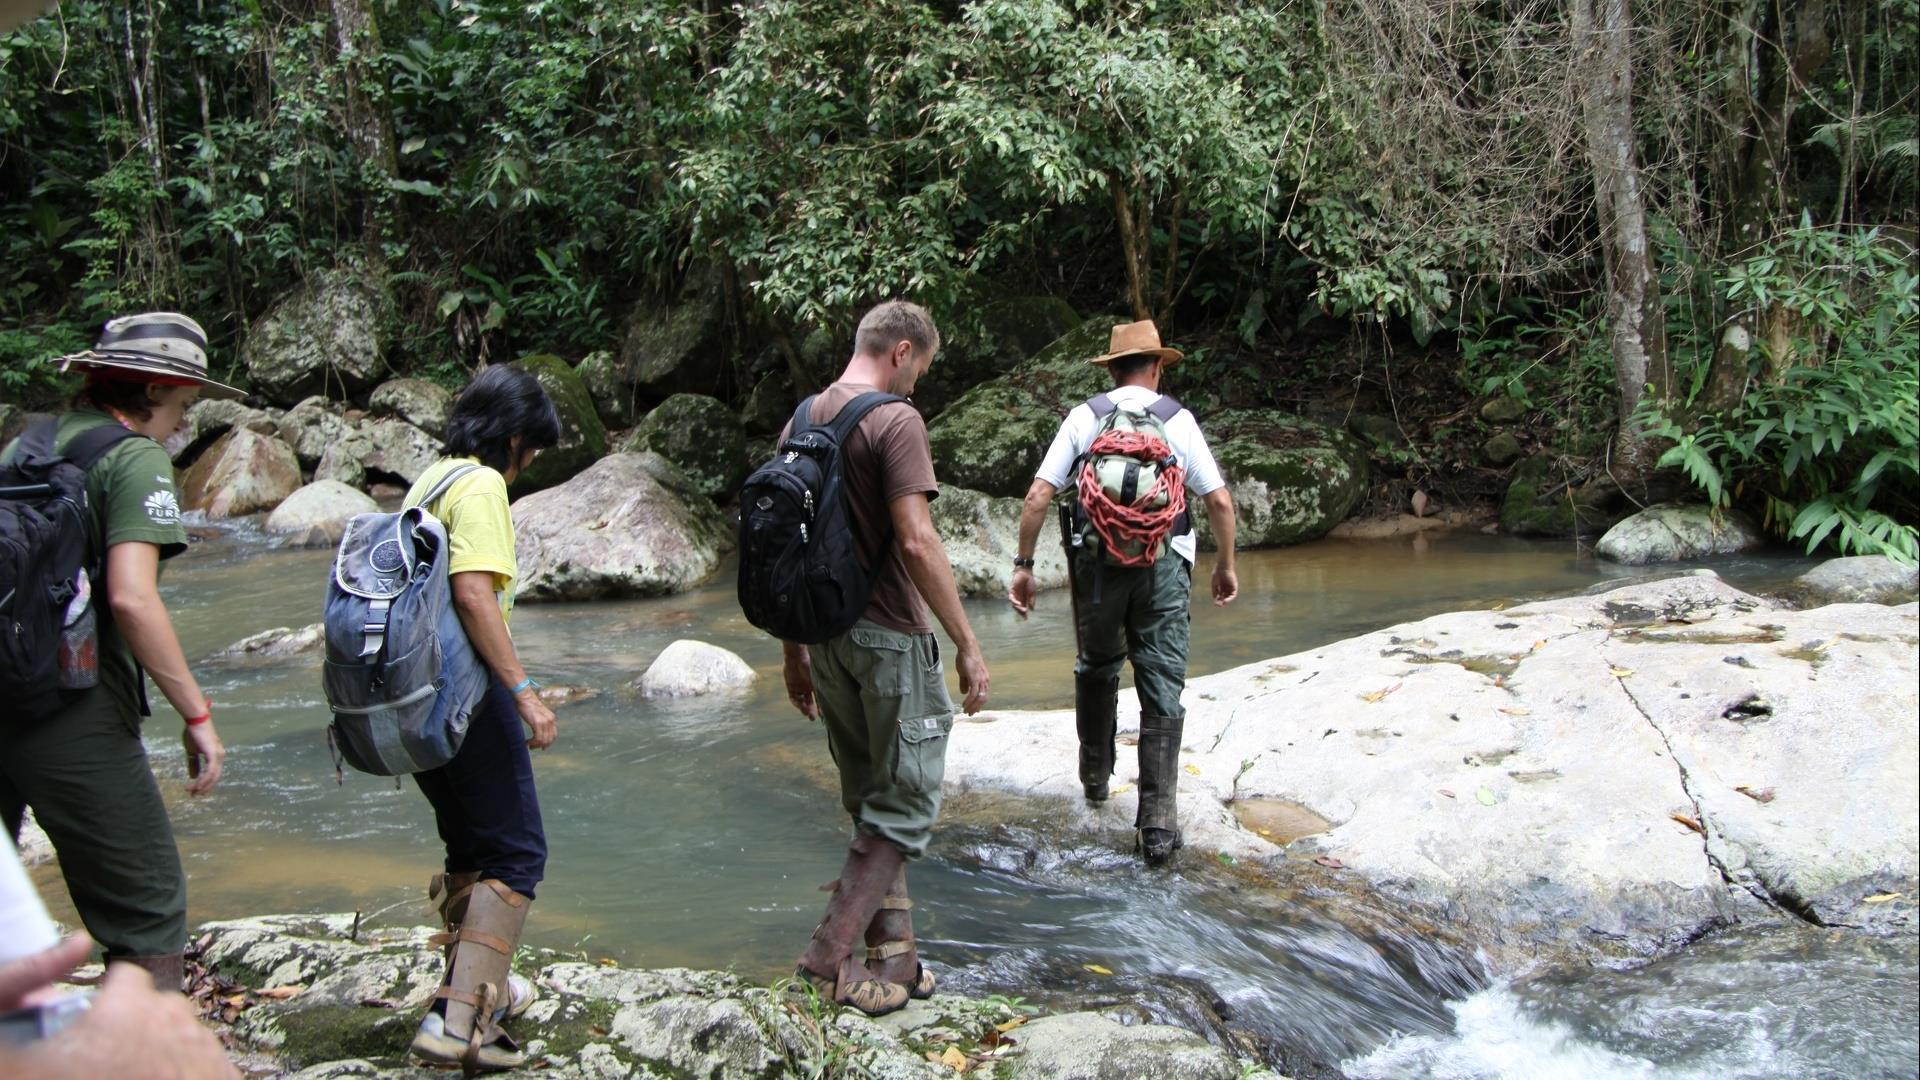 Brasilien Santa Catarina: 7 Tage Reisebaustein - Florianopolis aktiv erleben